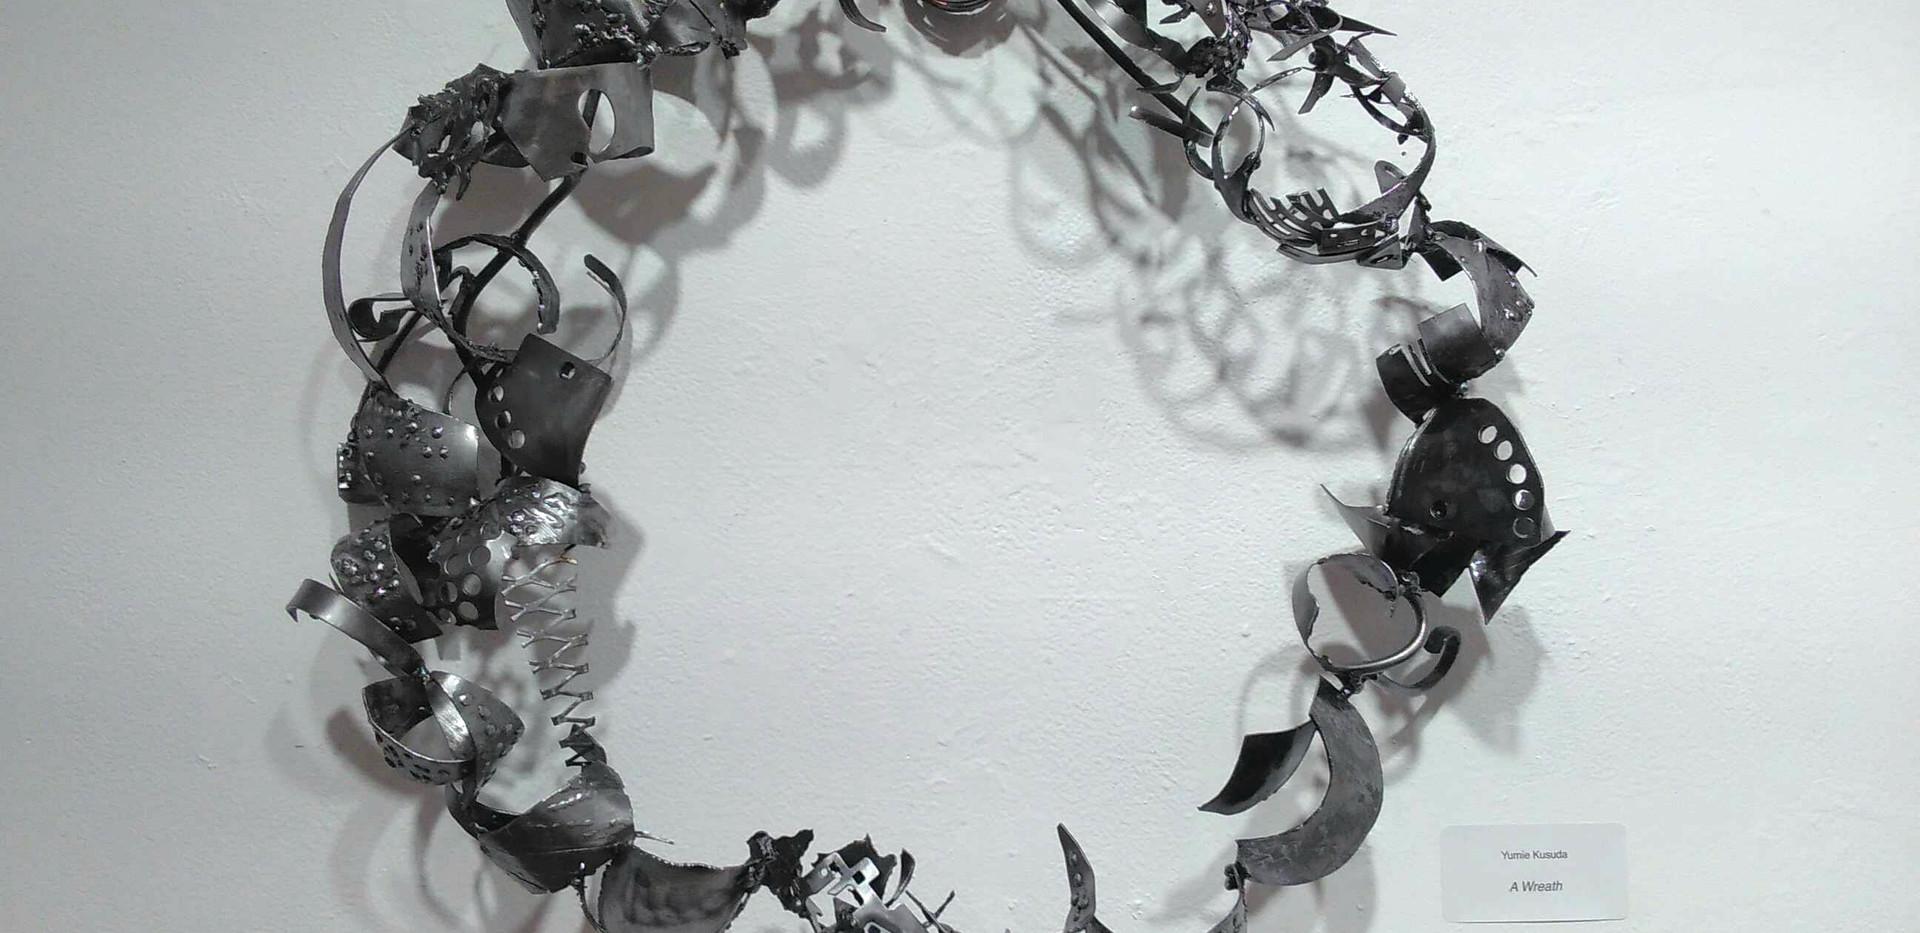 A Wreath_24x24x5_welding metals